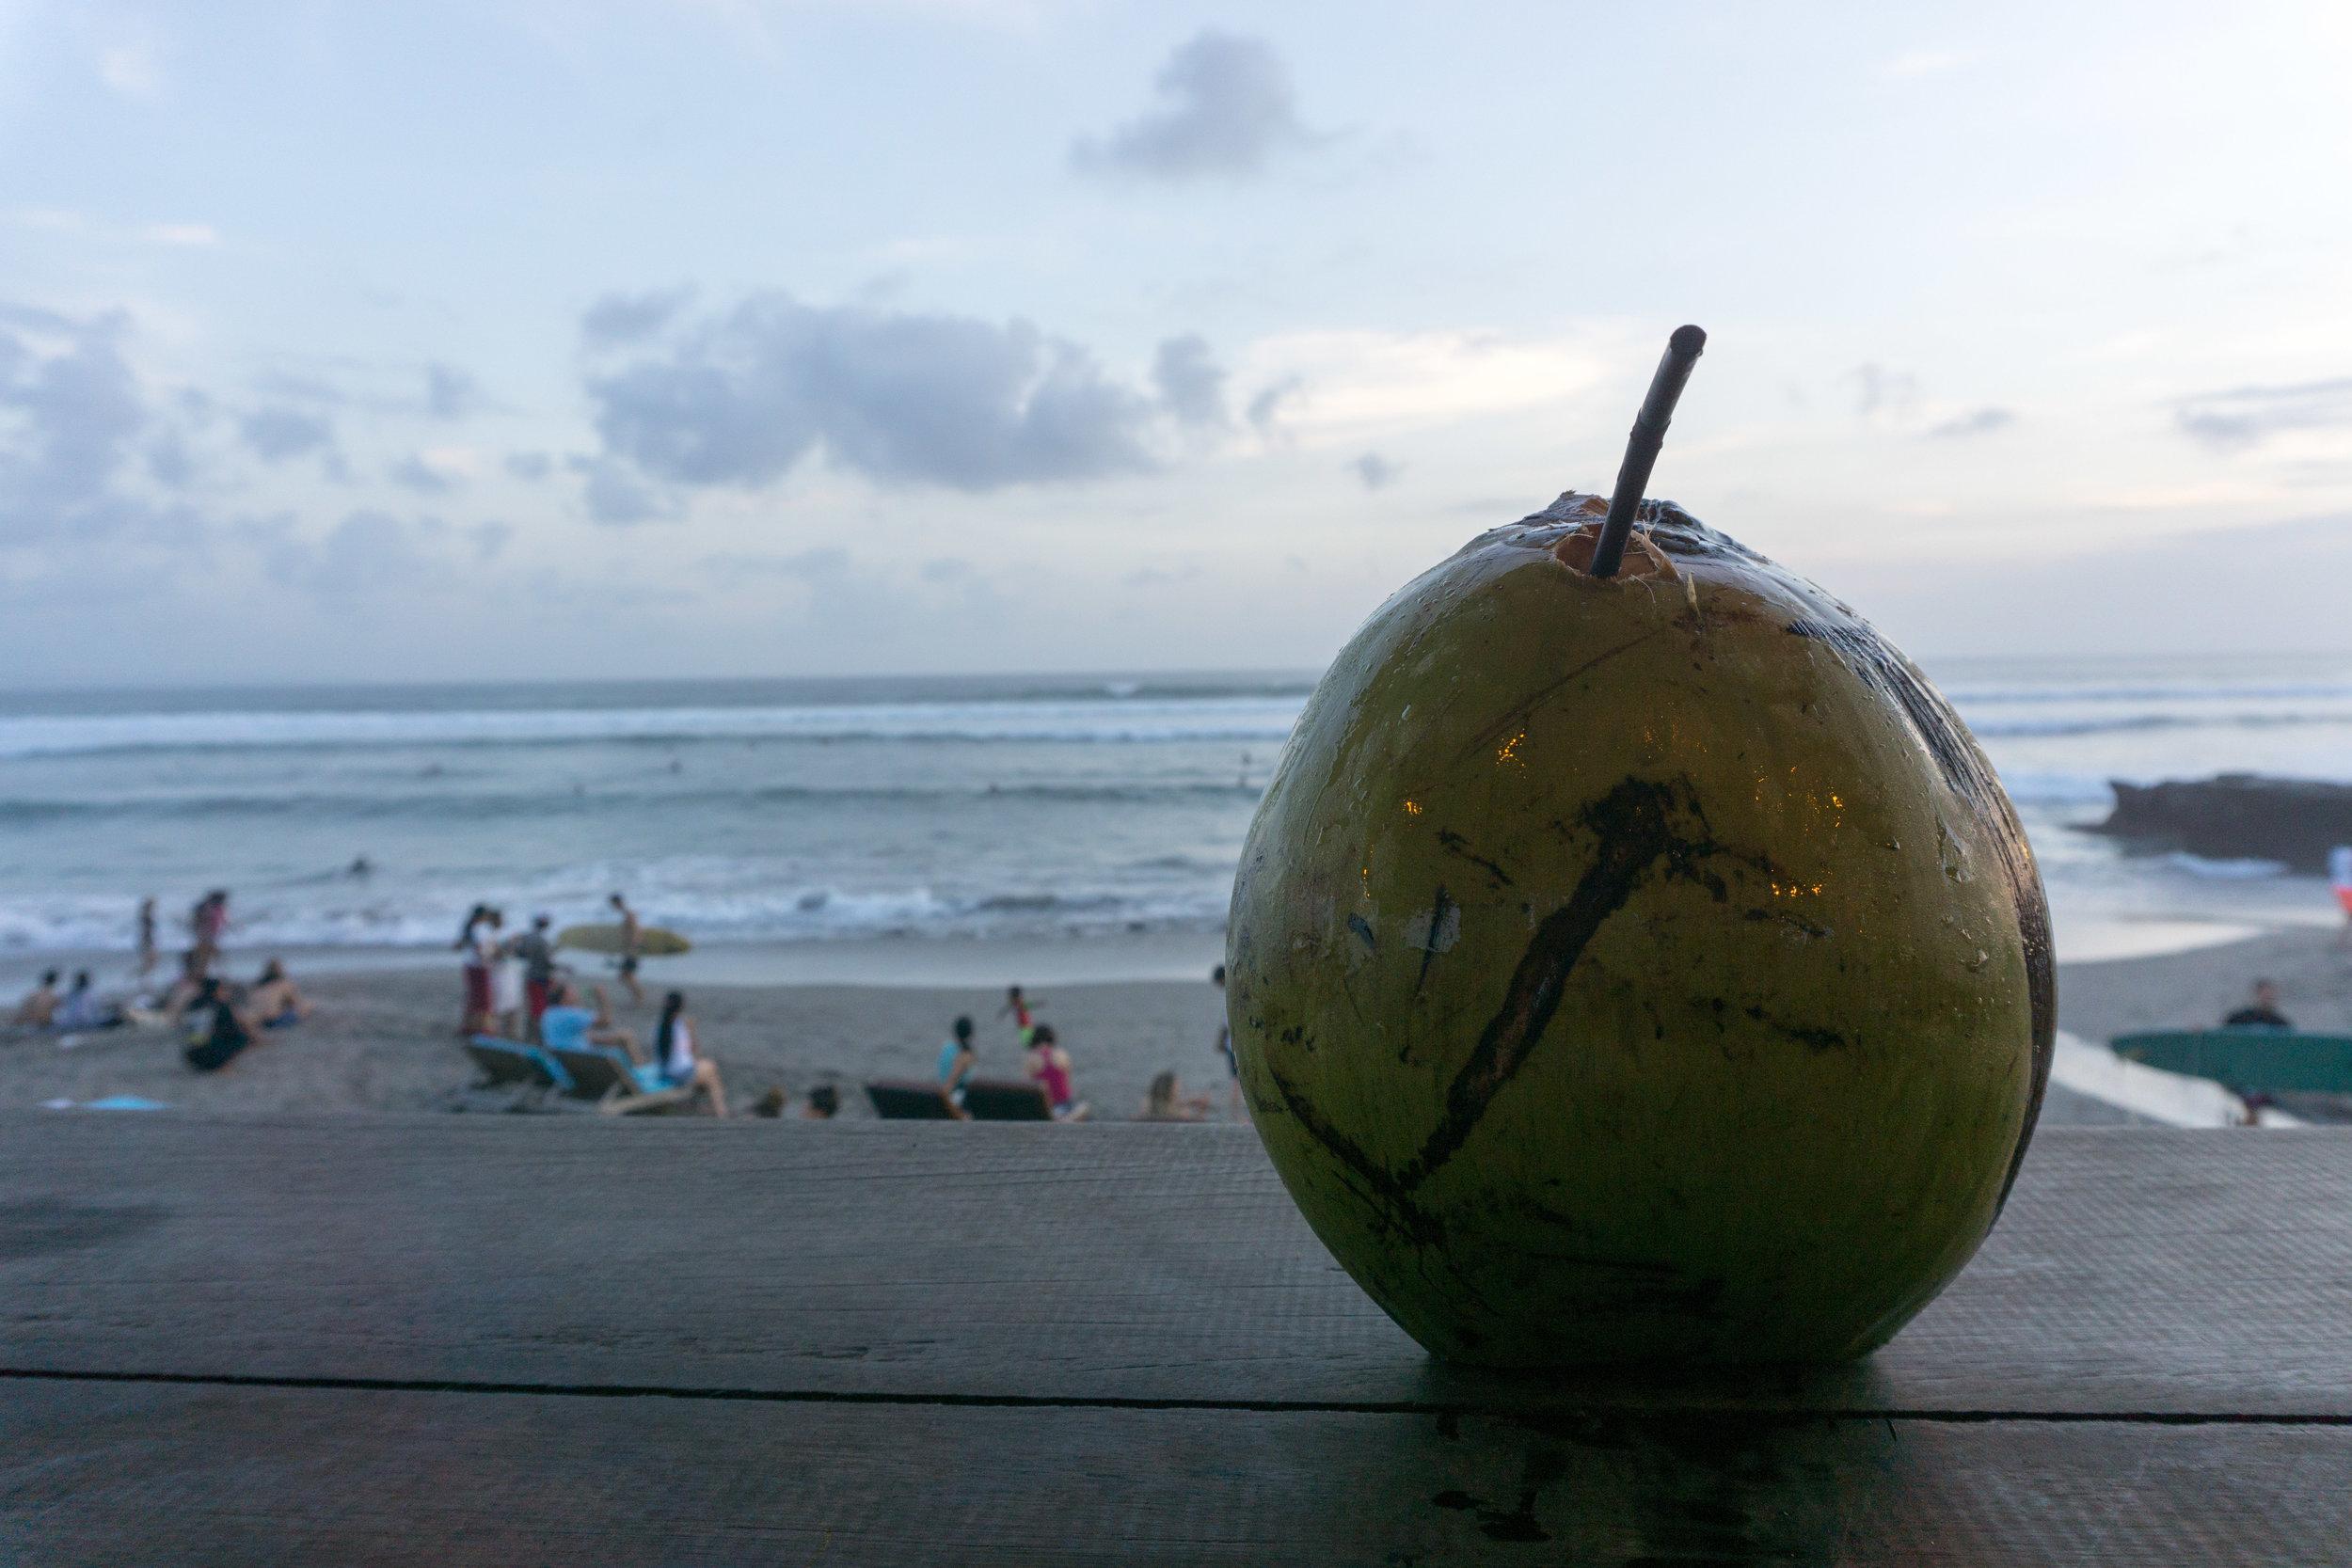 Coconut sunset near echo beach